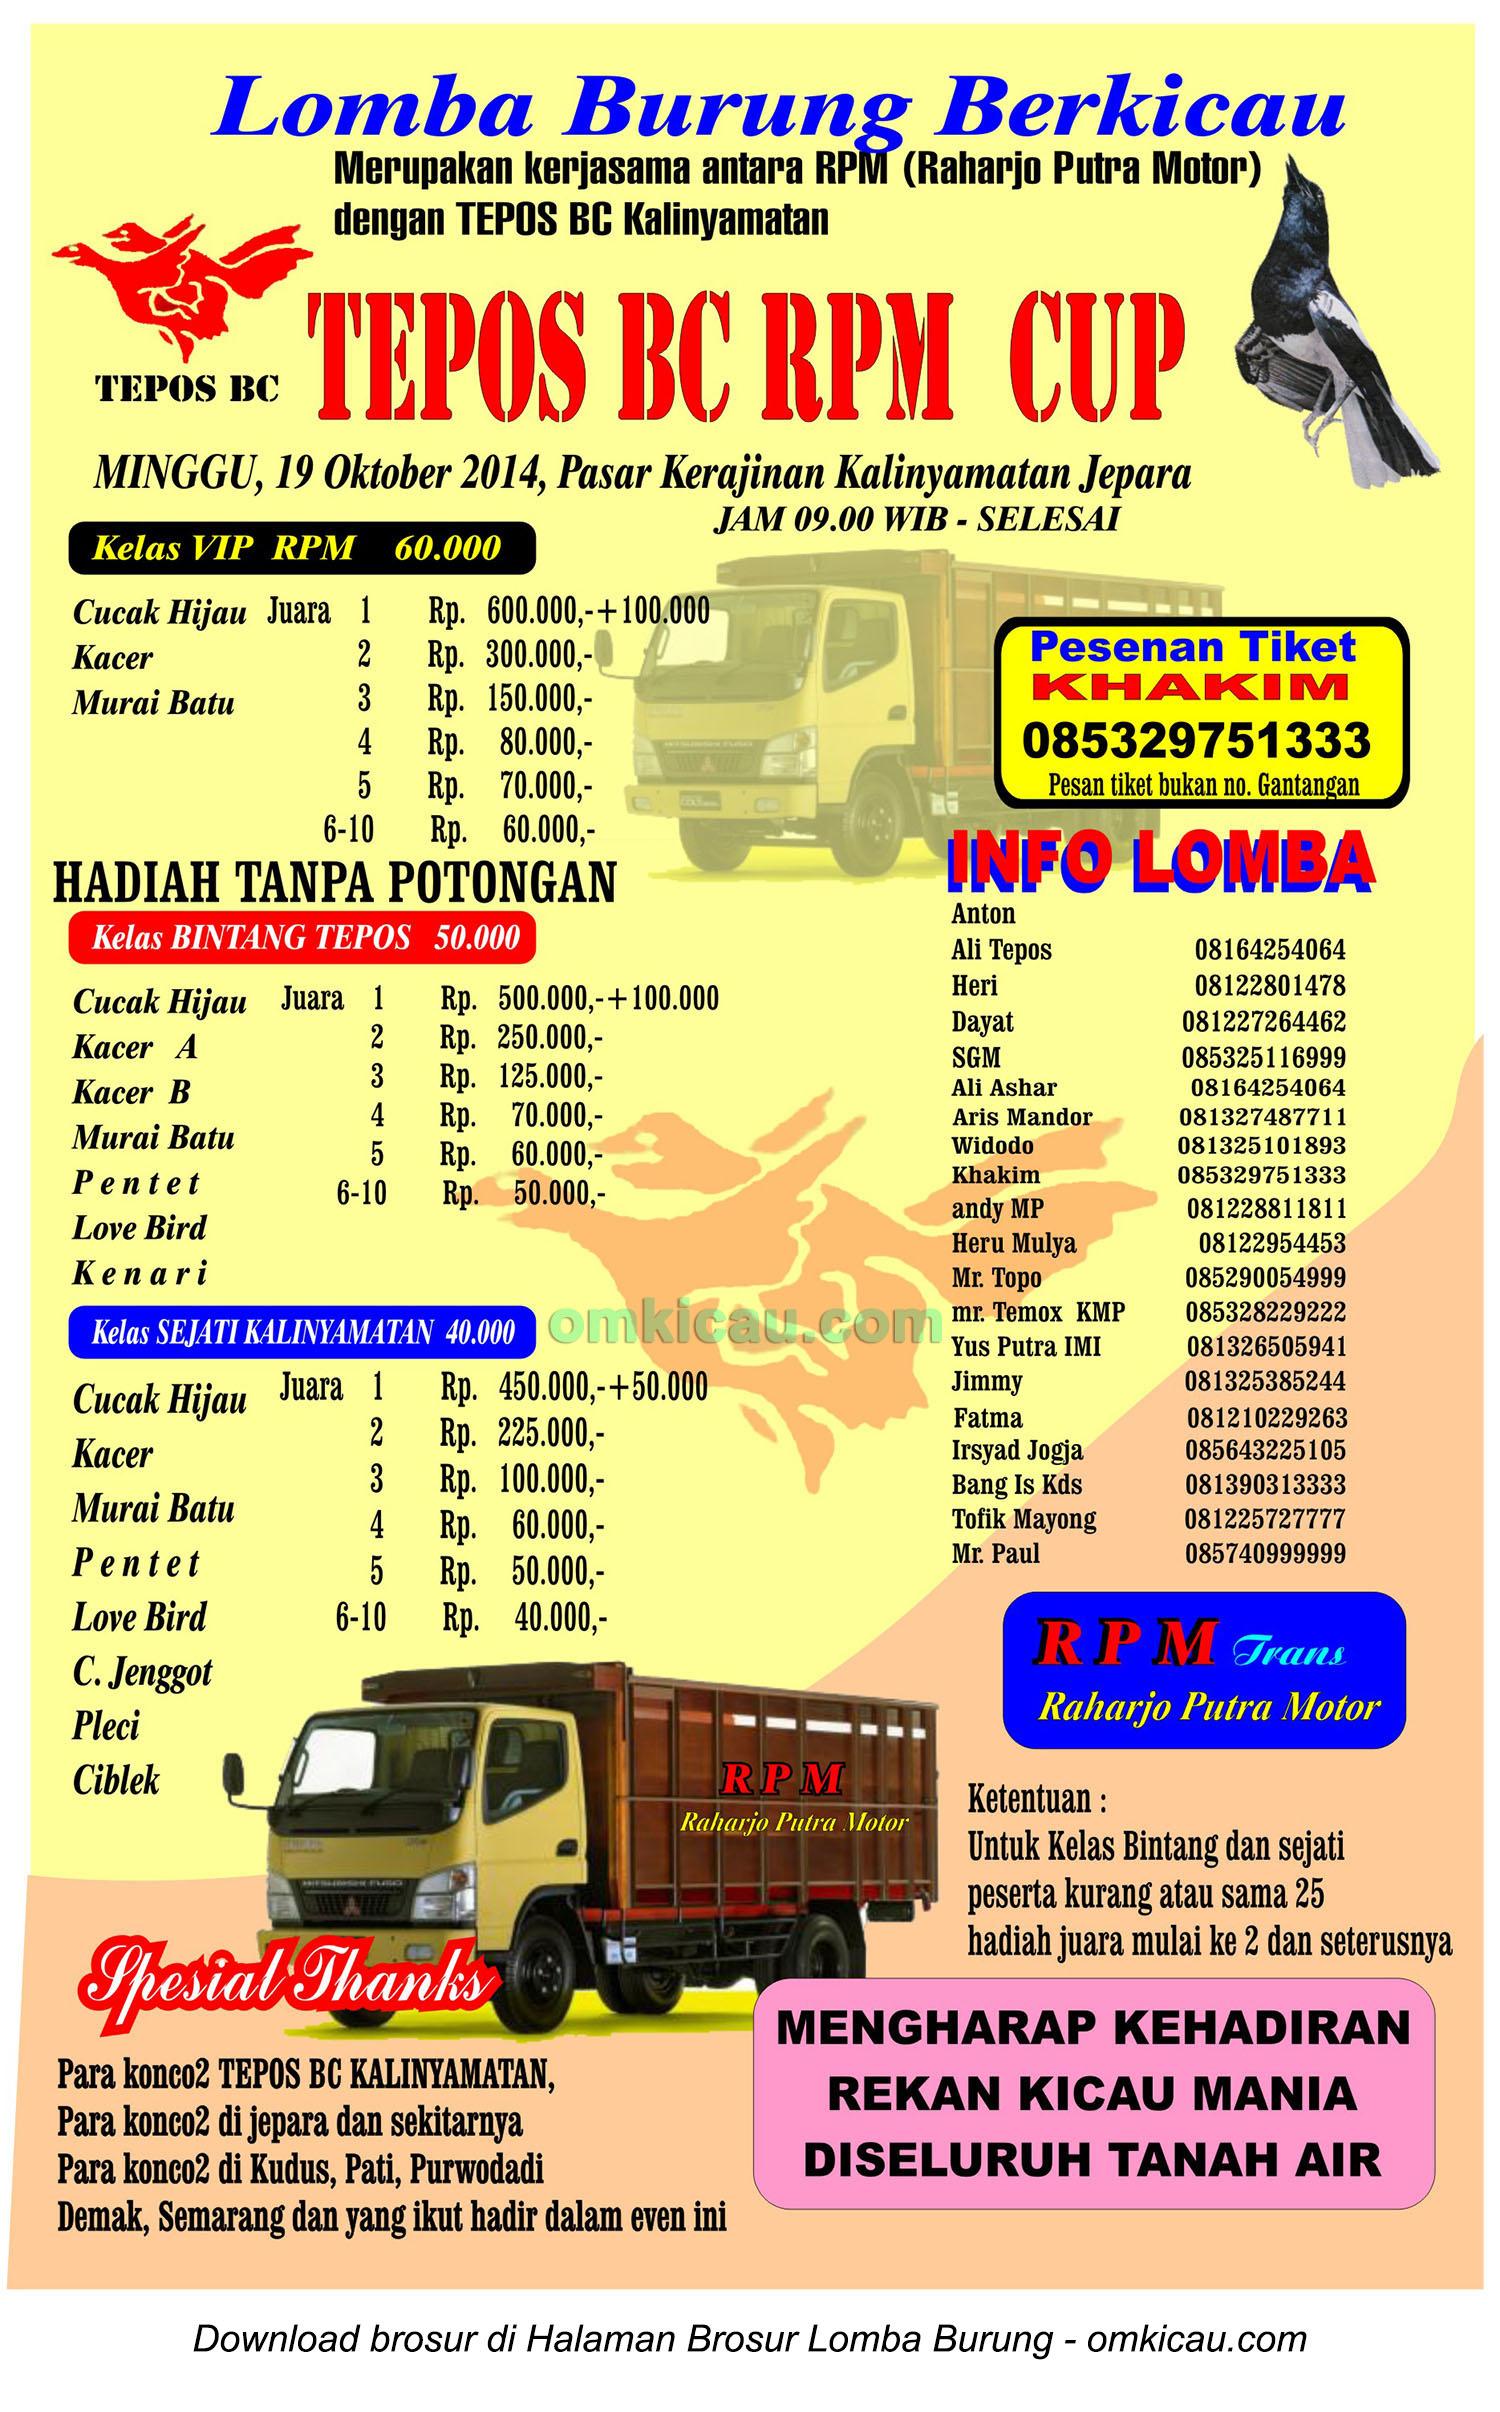 Brosur Lomba Burung Berkicau Tepos BC RPM Cup, Jepara, 19 Oktober 2014